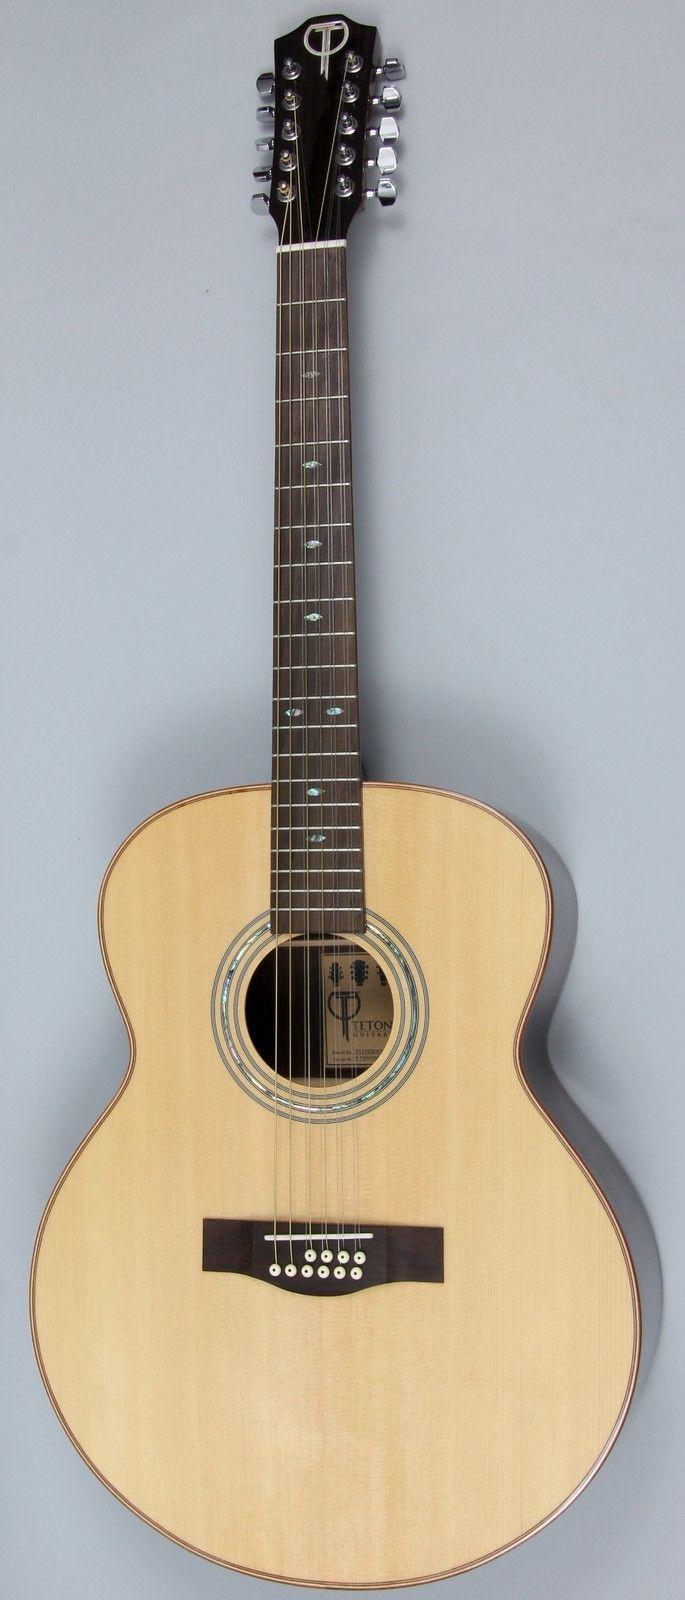 20 best Guitars images on Pinterest | Musical instruments, Bass ...